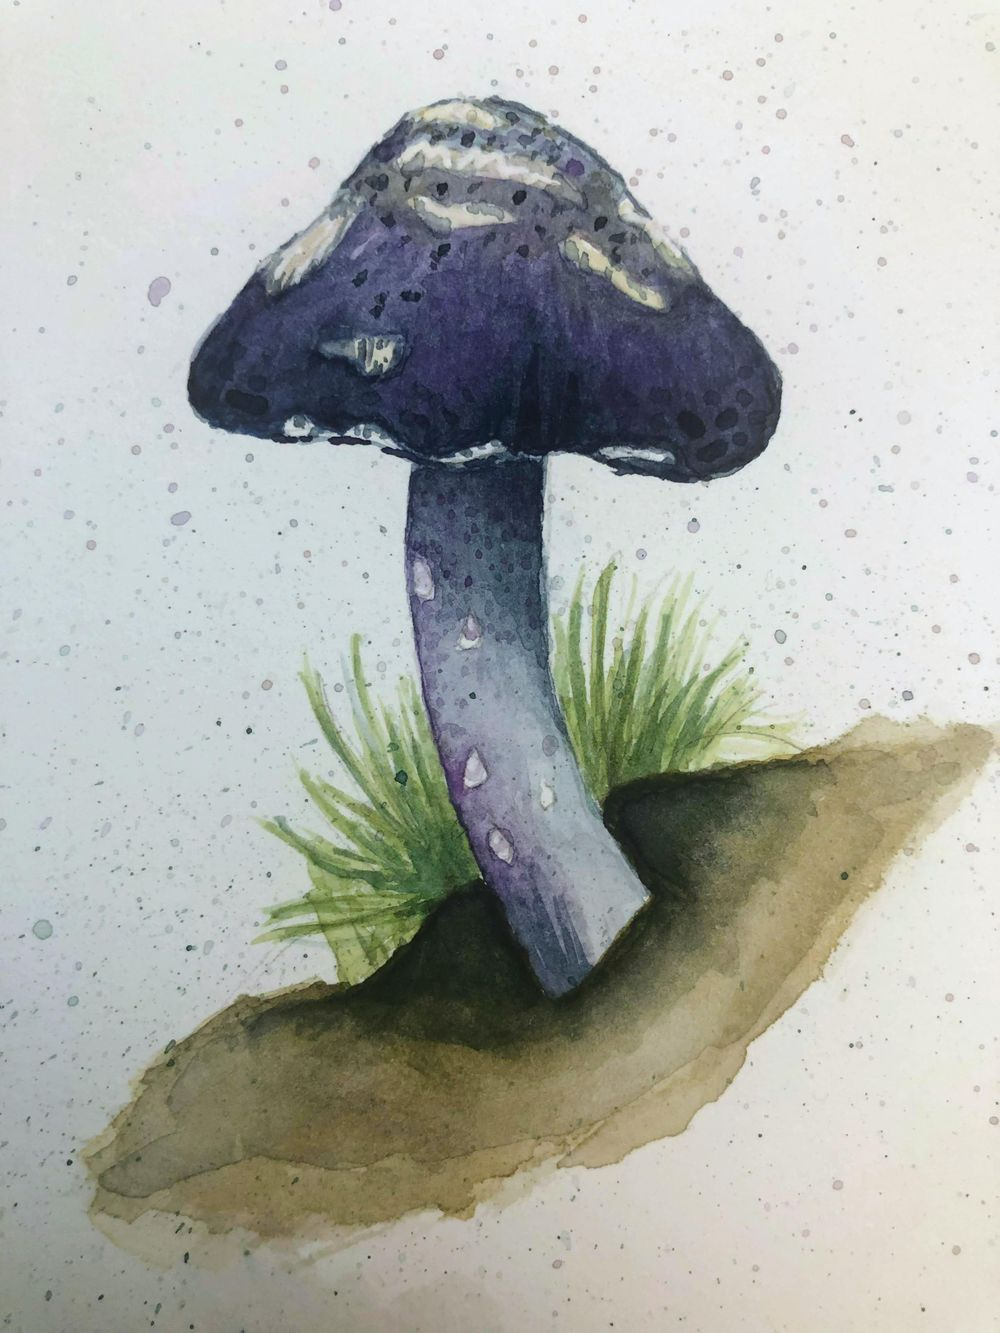 Mushroom & Fern Exercises - image 1 - student project